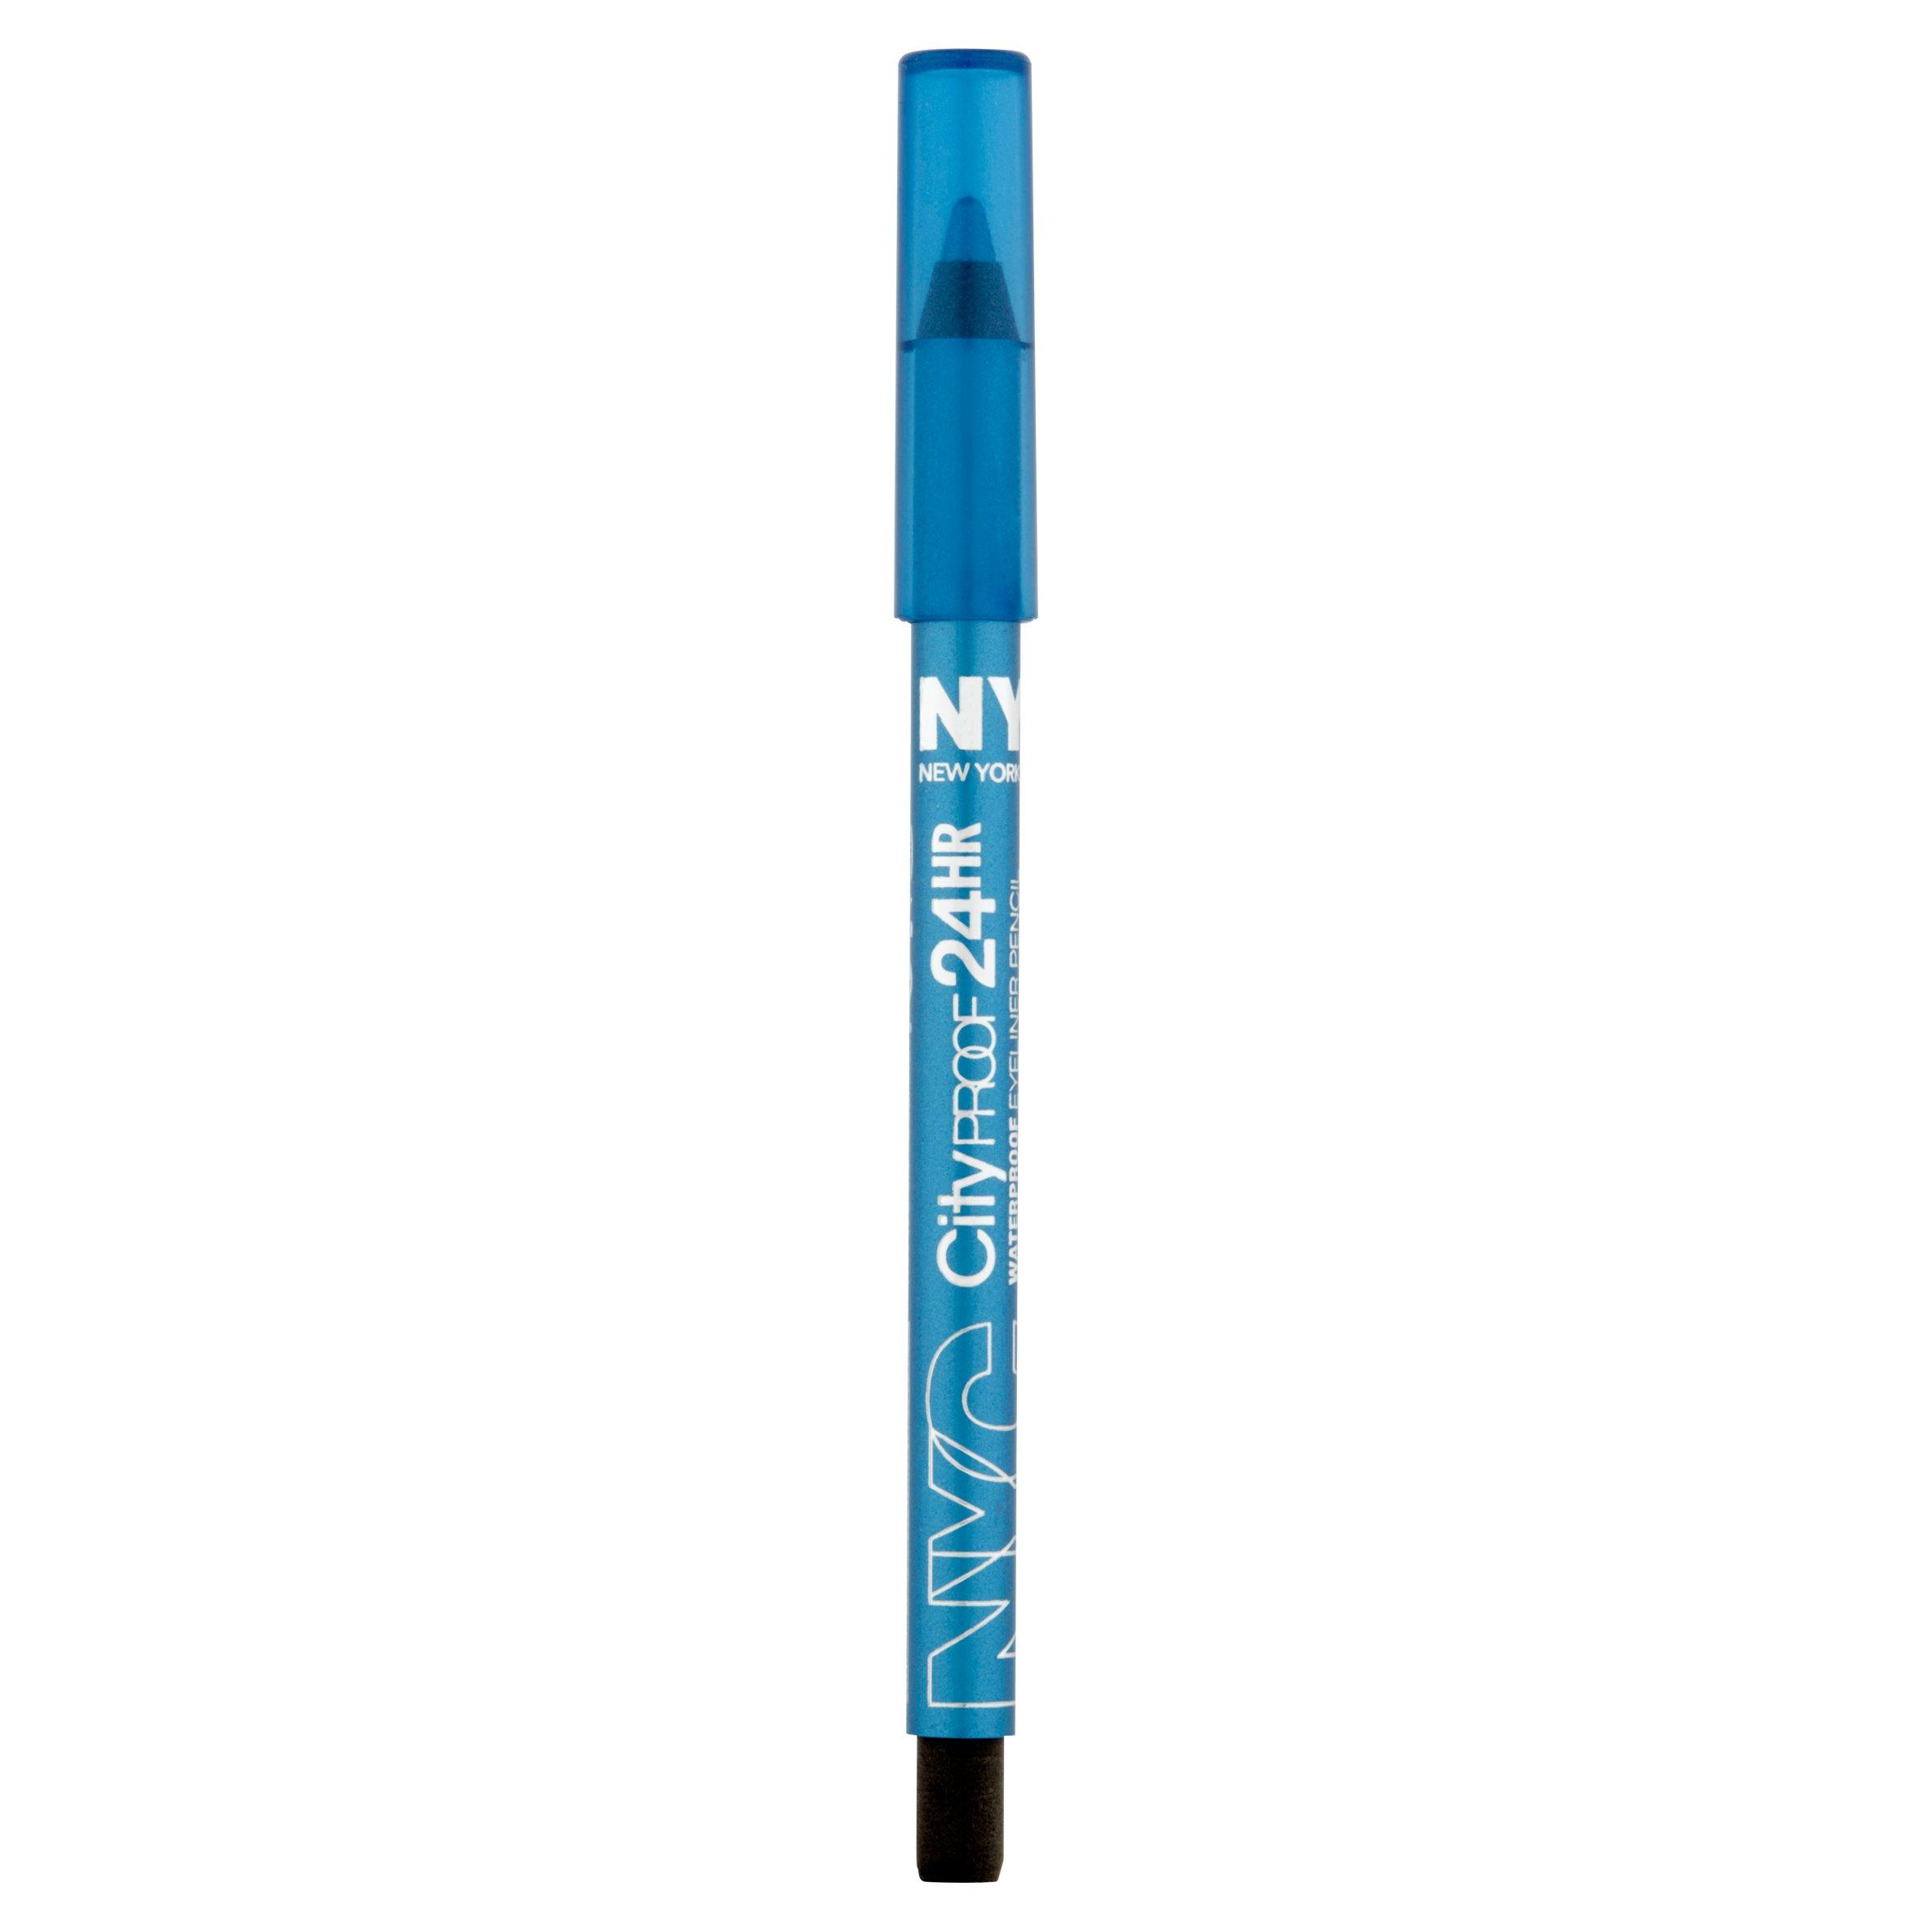 New York Color Proof 24 Hr 936A Sky High Waterproof Eyeliner Pencil, 0.042 oz